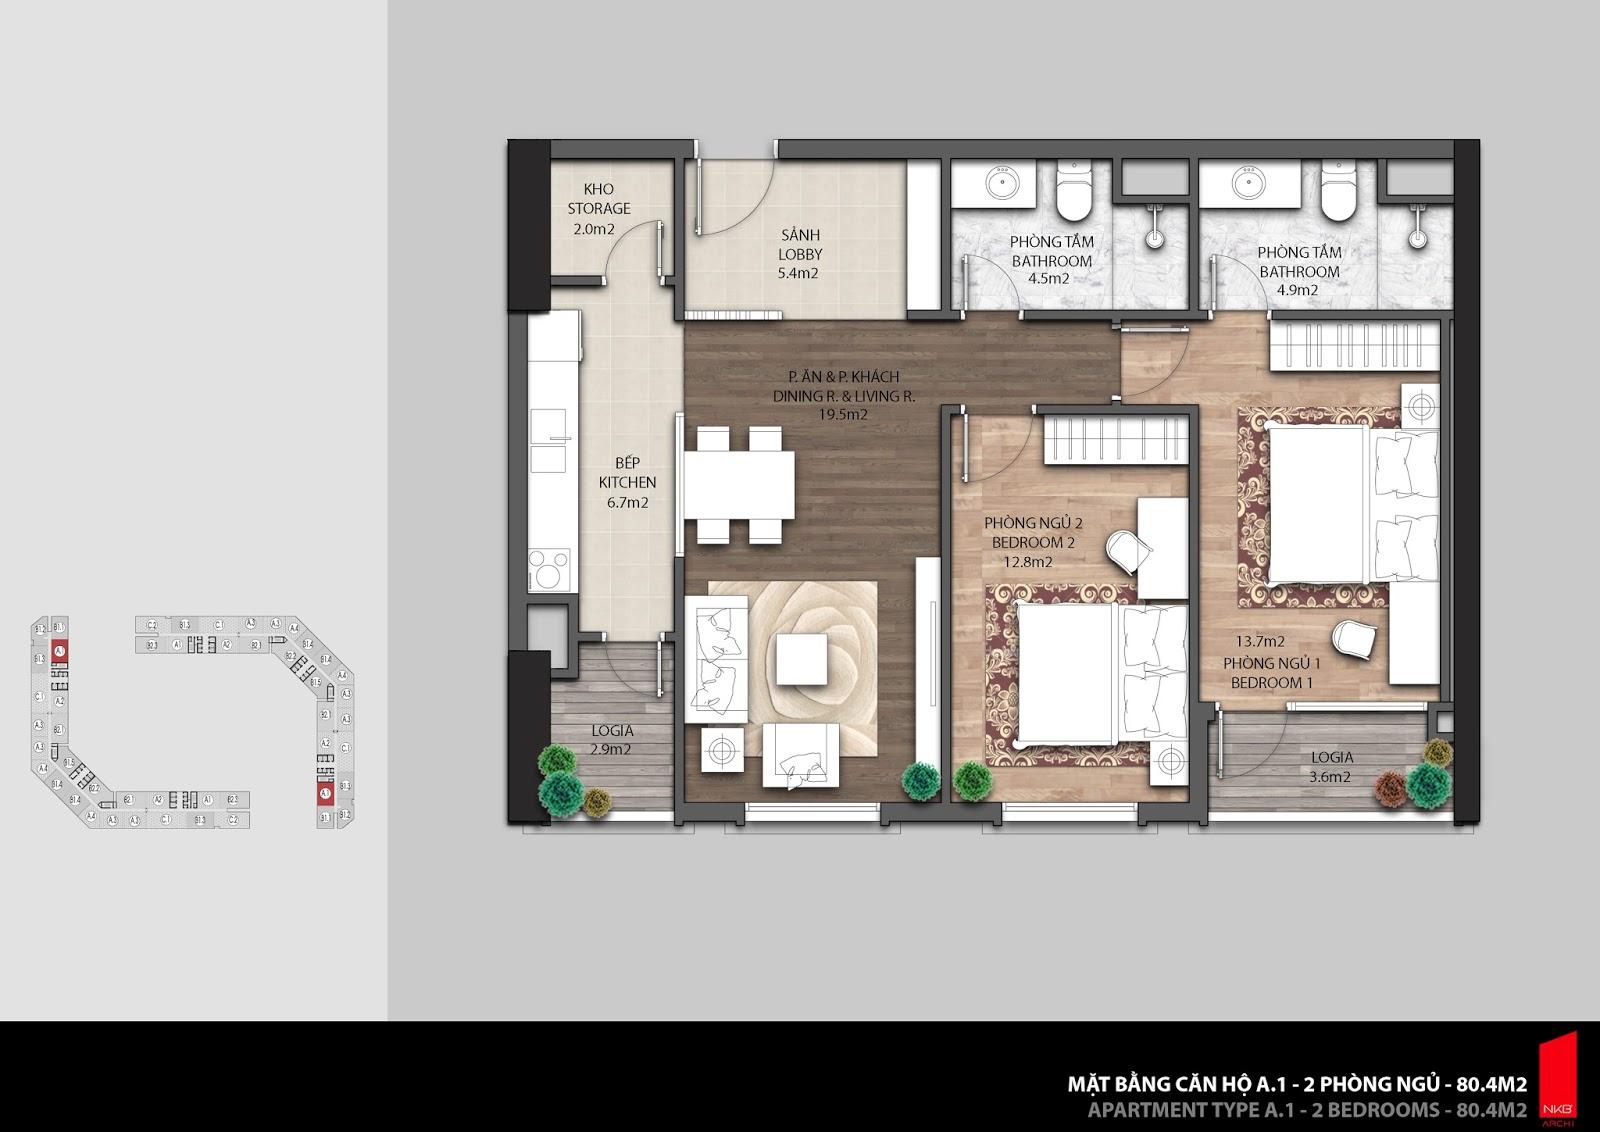 Mặt bằng căn hộ 80,4m2